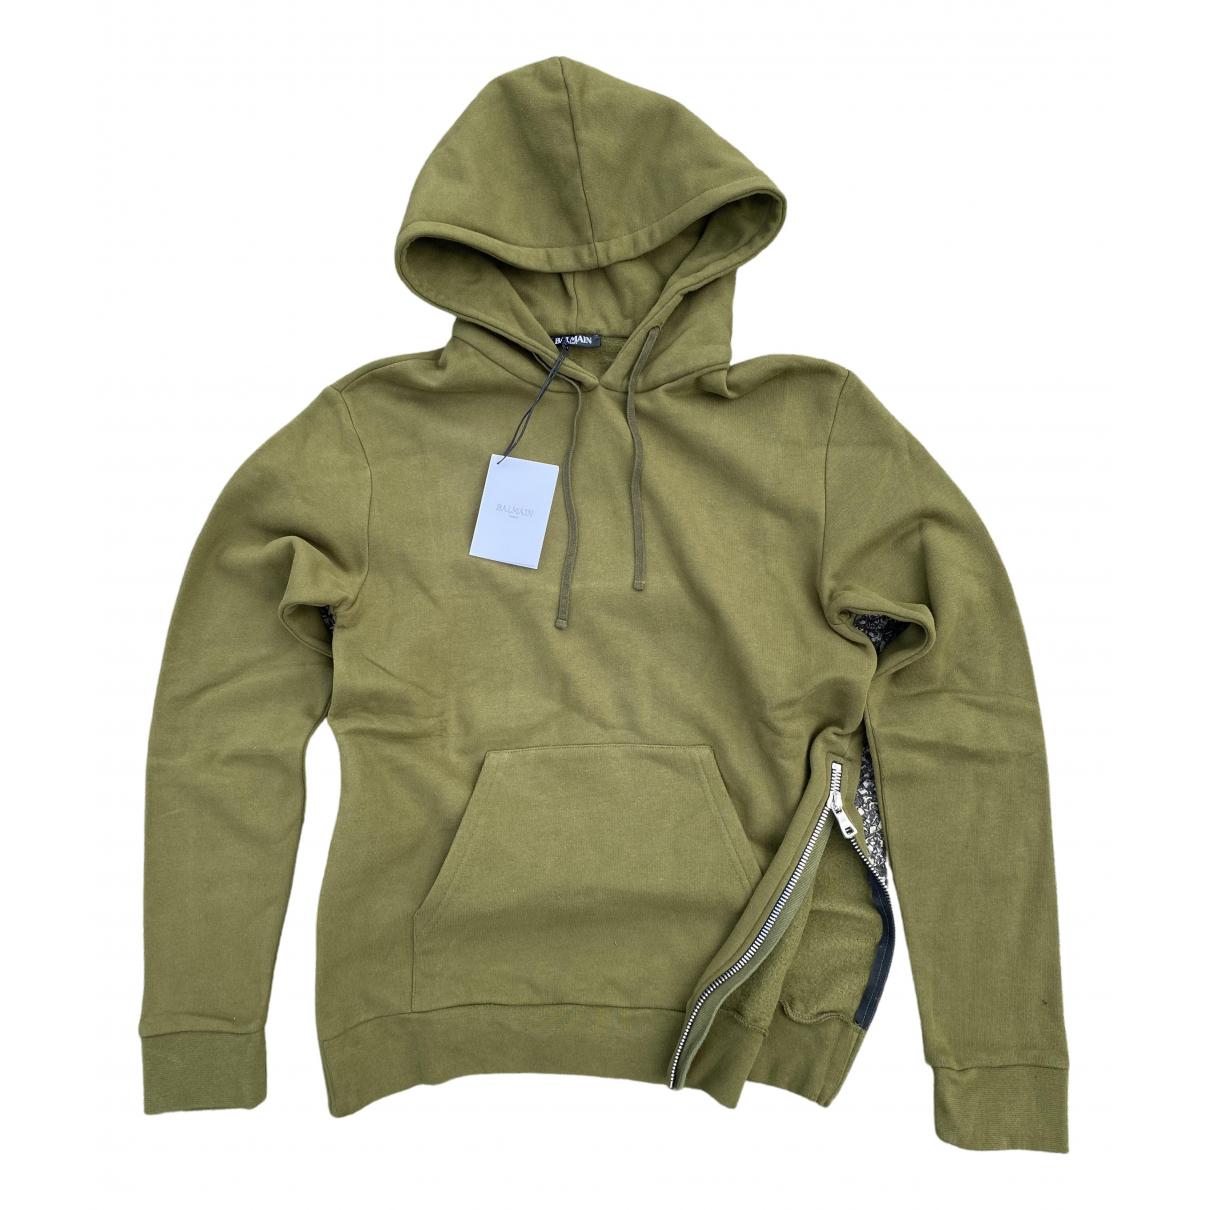 Balmain \N Khaki Cotton Knitwear & Sweatshirts for Men M International